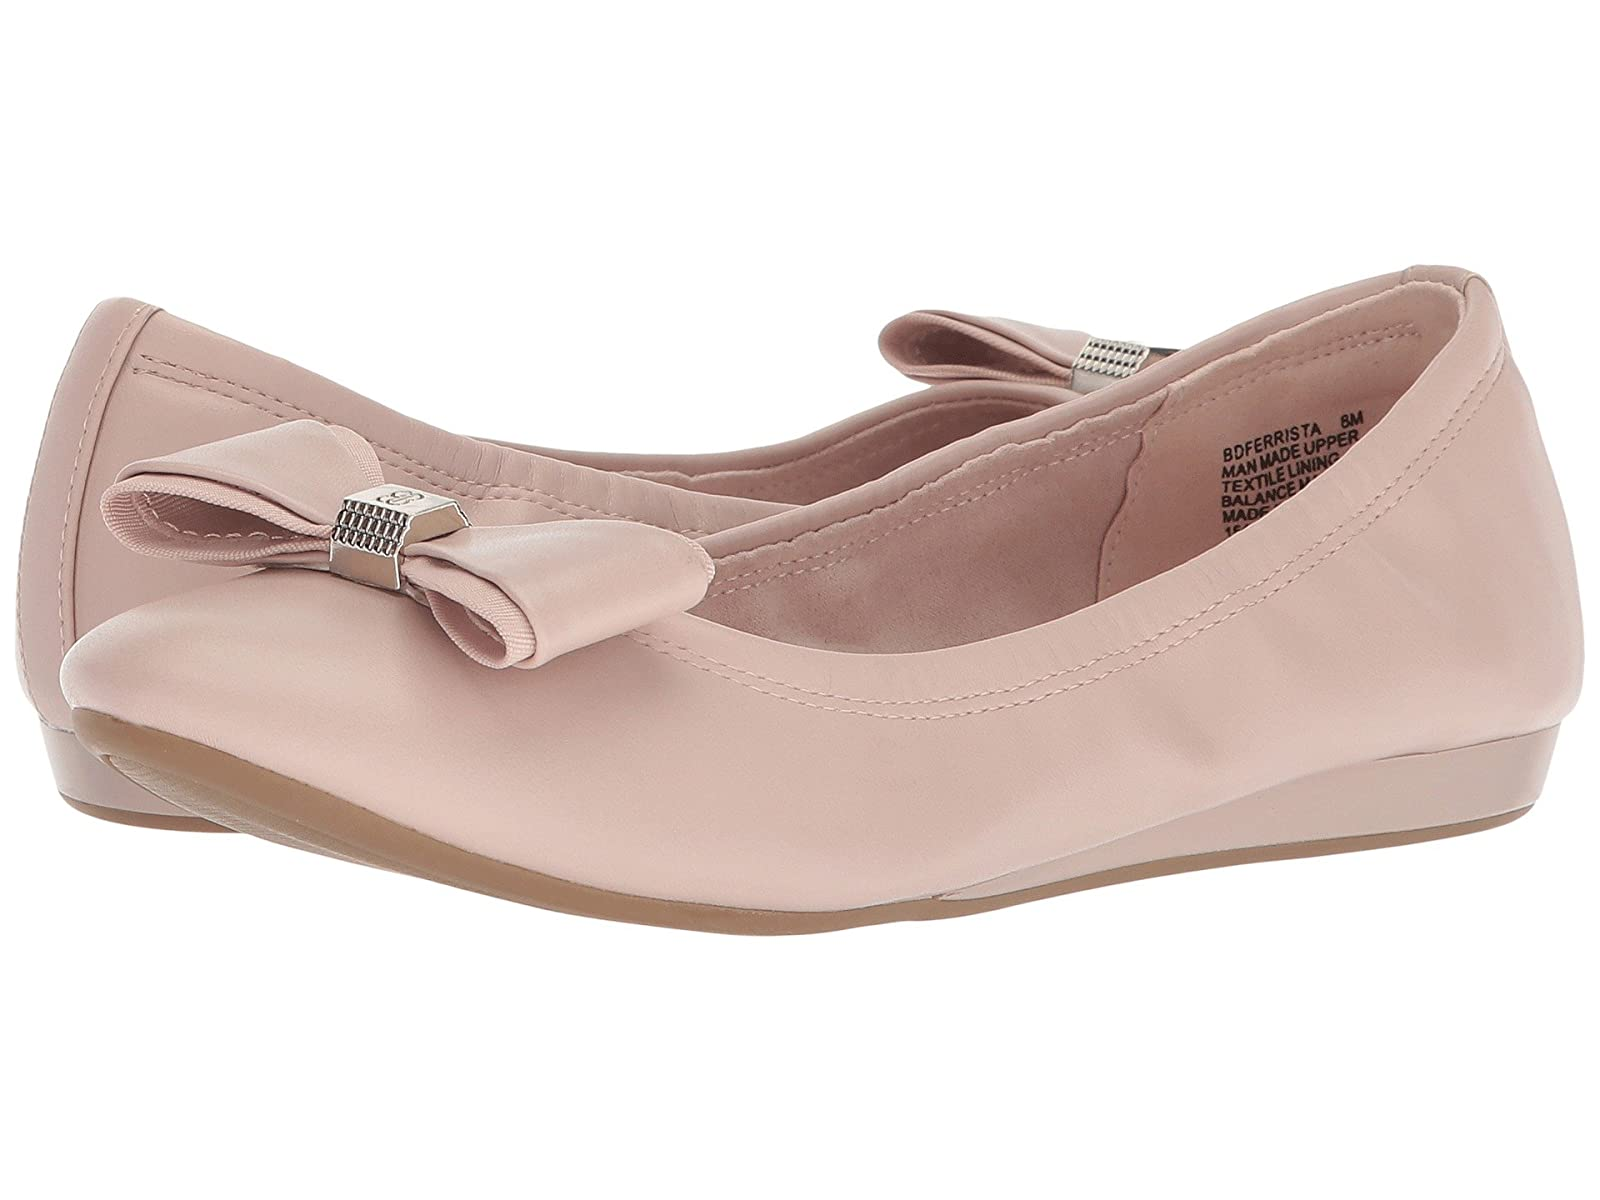 Bandolino FerristaCheap and distinctive eye-catching shoes